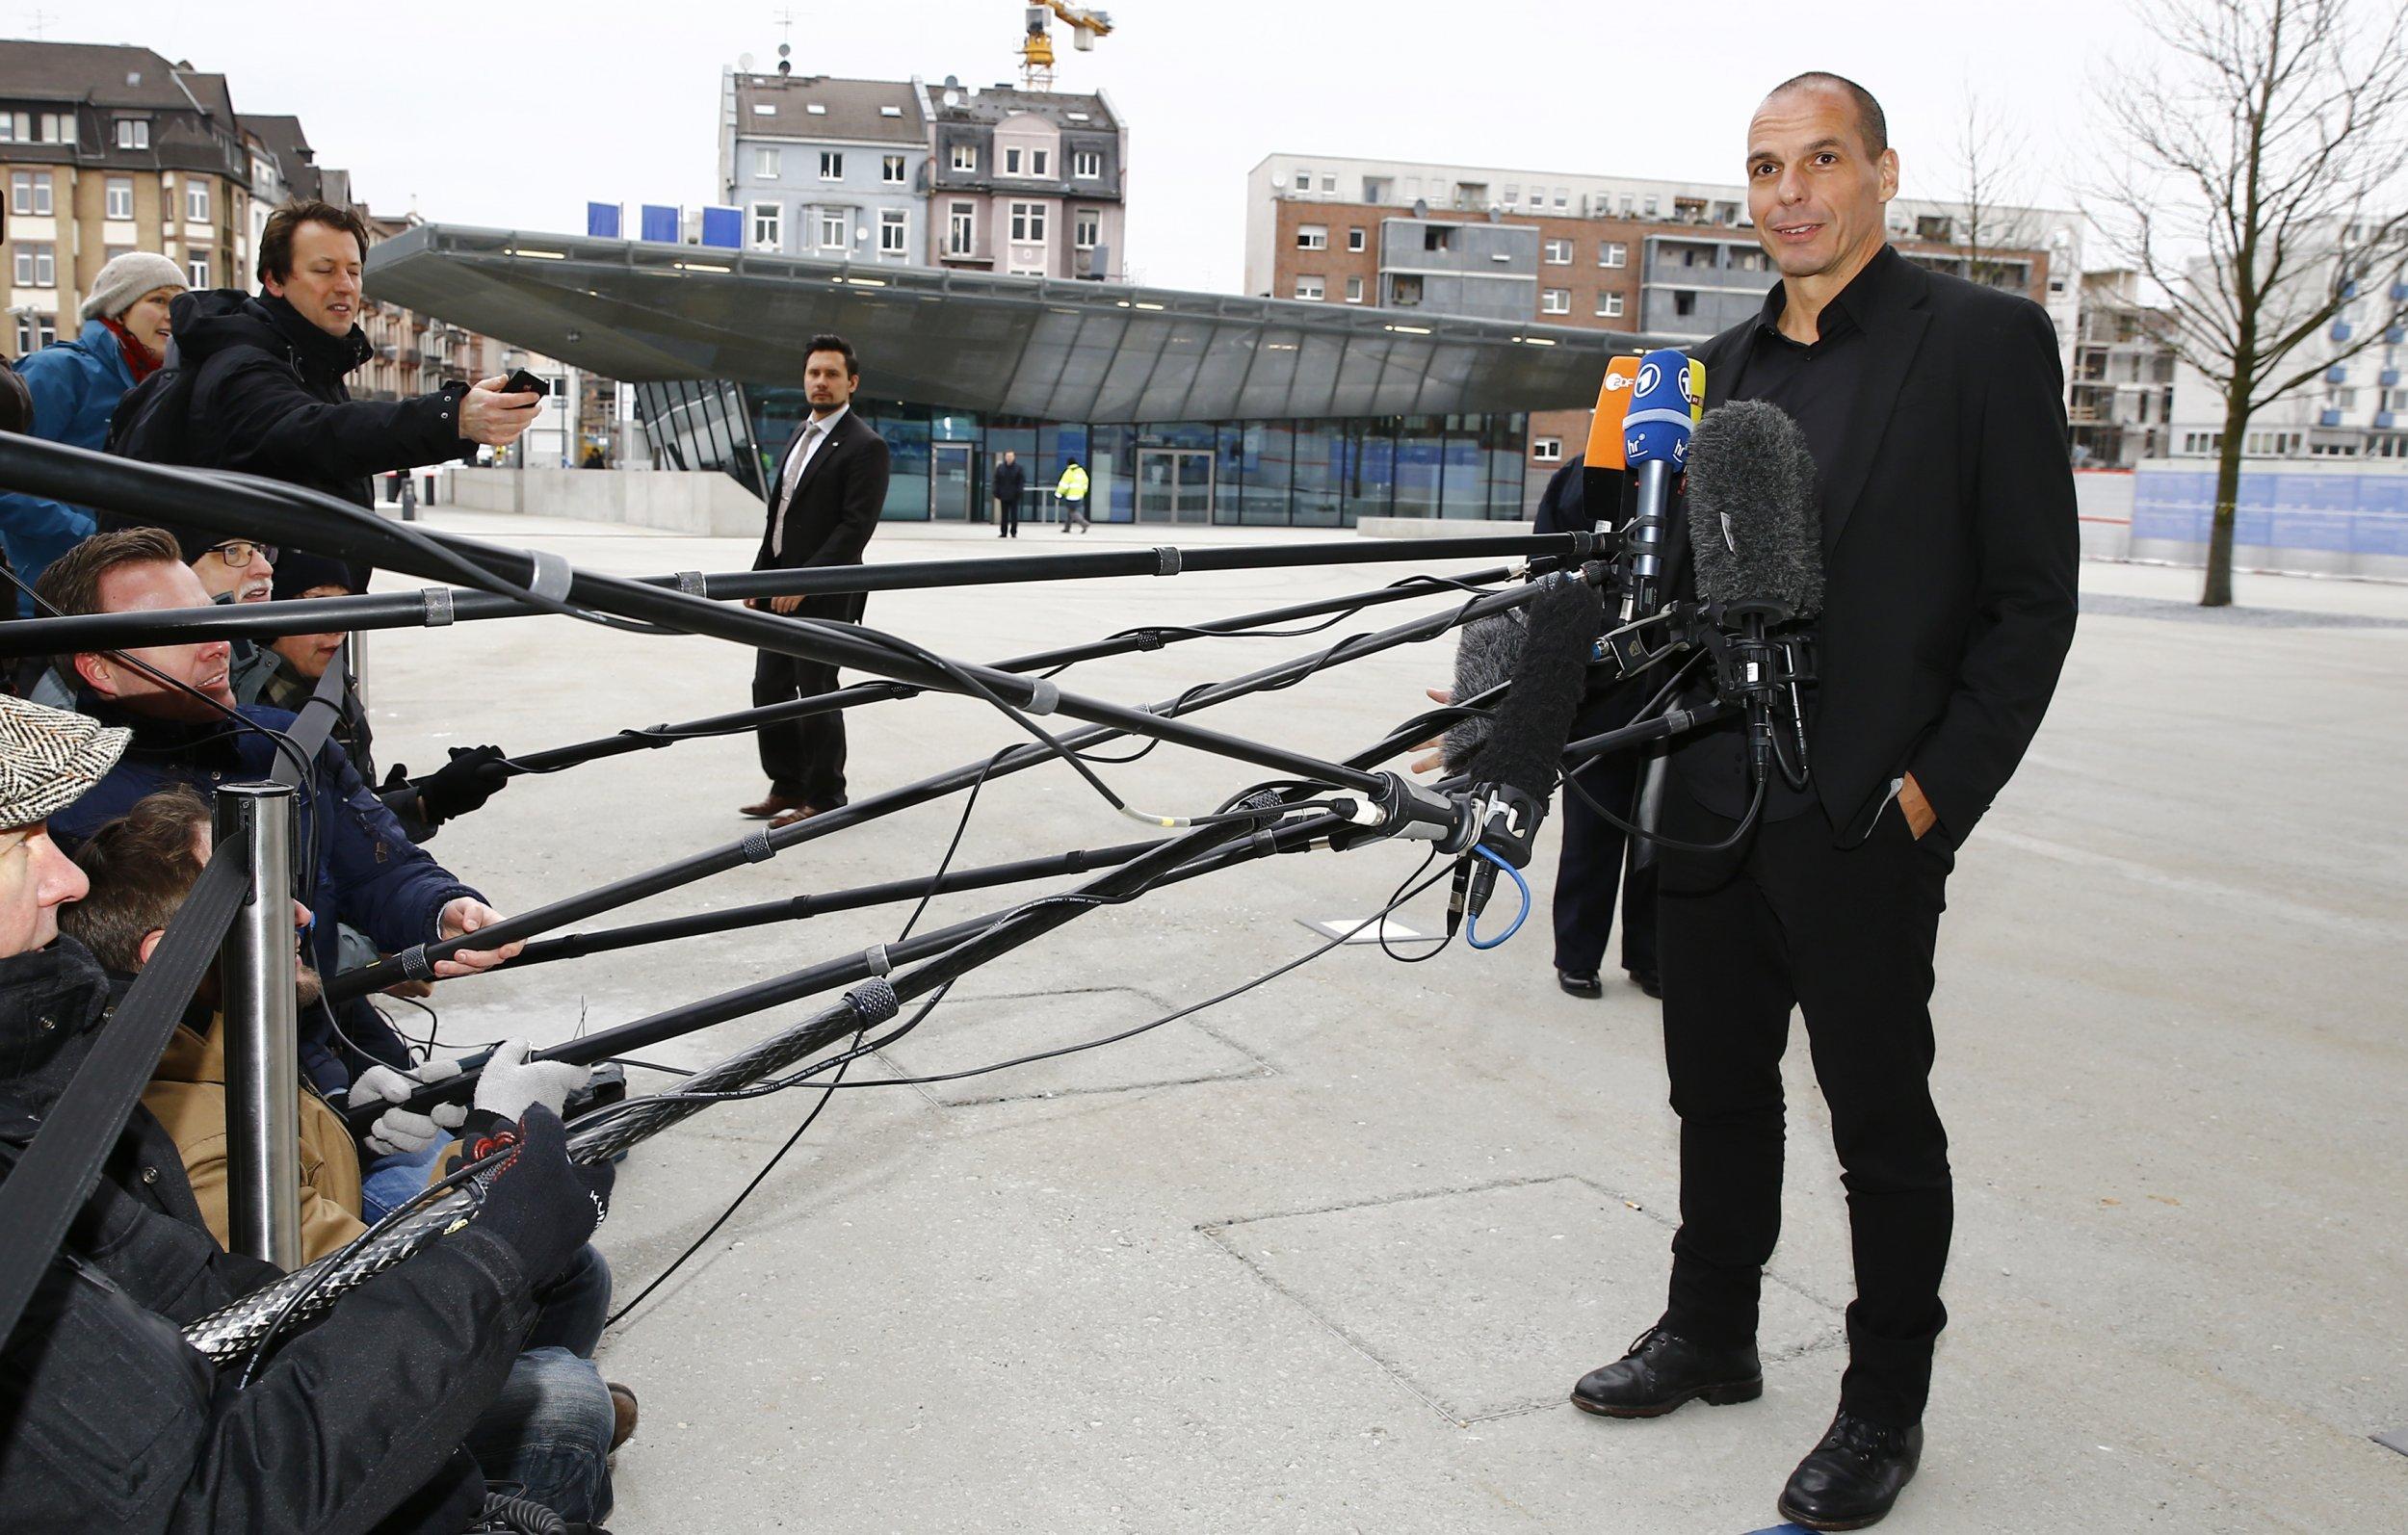 http://s.newsweek.com/sites/www.newsweek.com/files/styles/embedded/public/2015/02/04/varoufakis.jpg?itok=BXUXb_vv